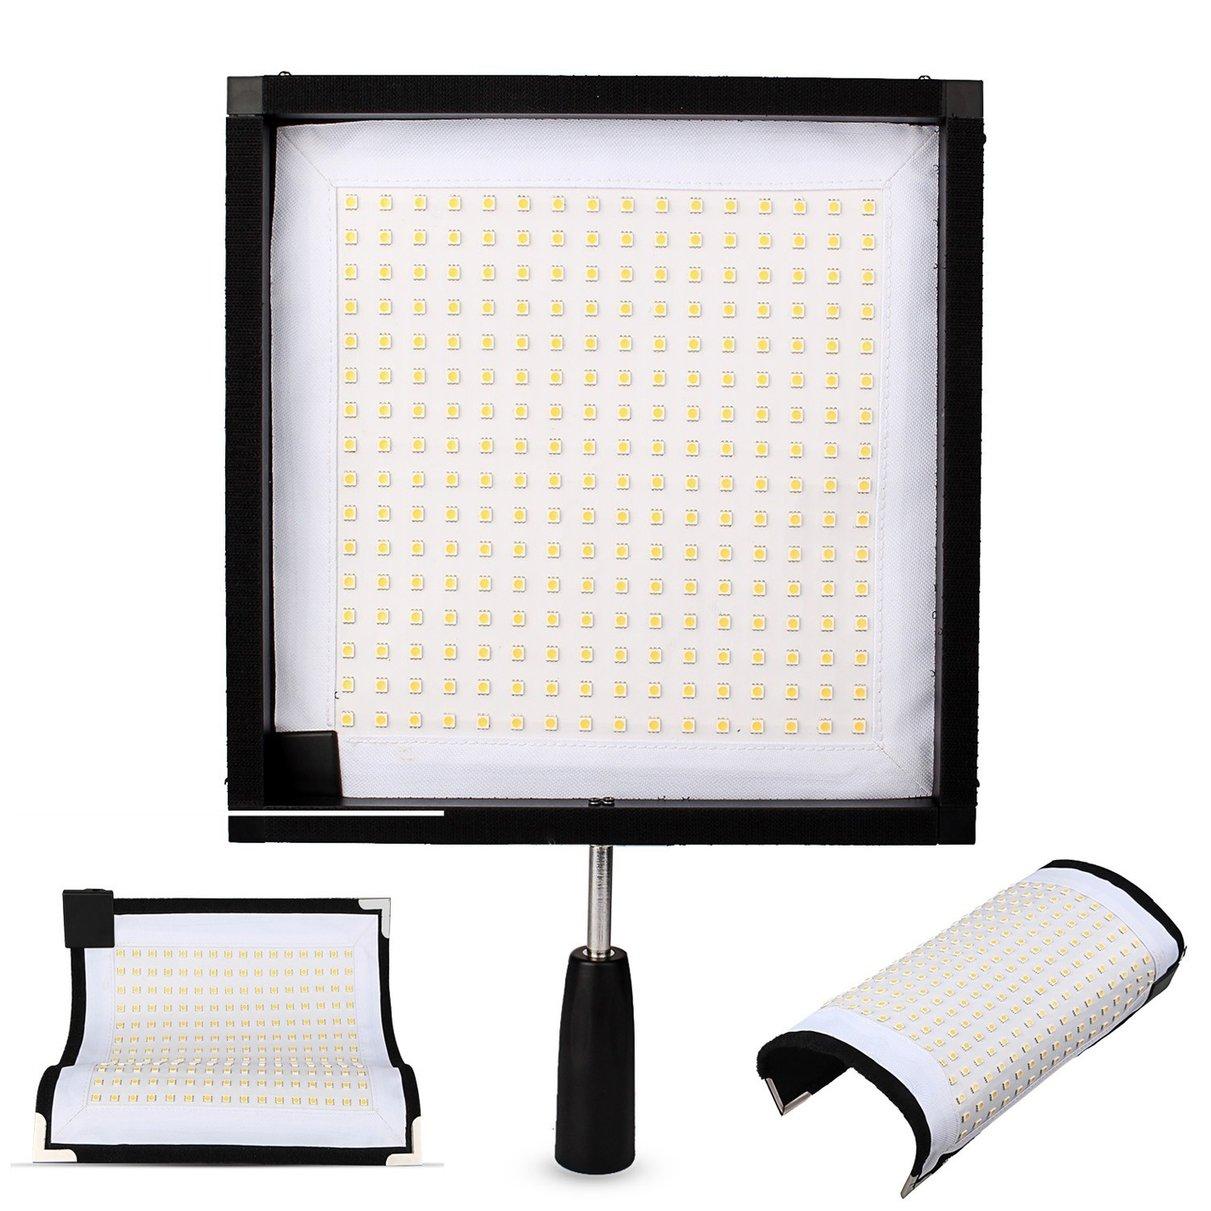 Travor FL 3030 30x30cm Flex Mat 5500K 256 LED Flexible Moldable LED Video Fabric Light Slim Ultralight Panel with 2.4G Remote